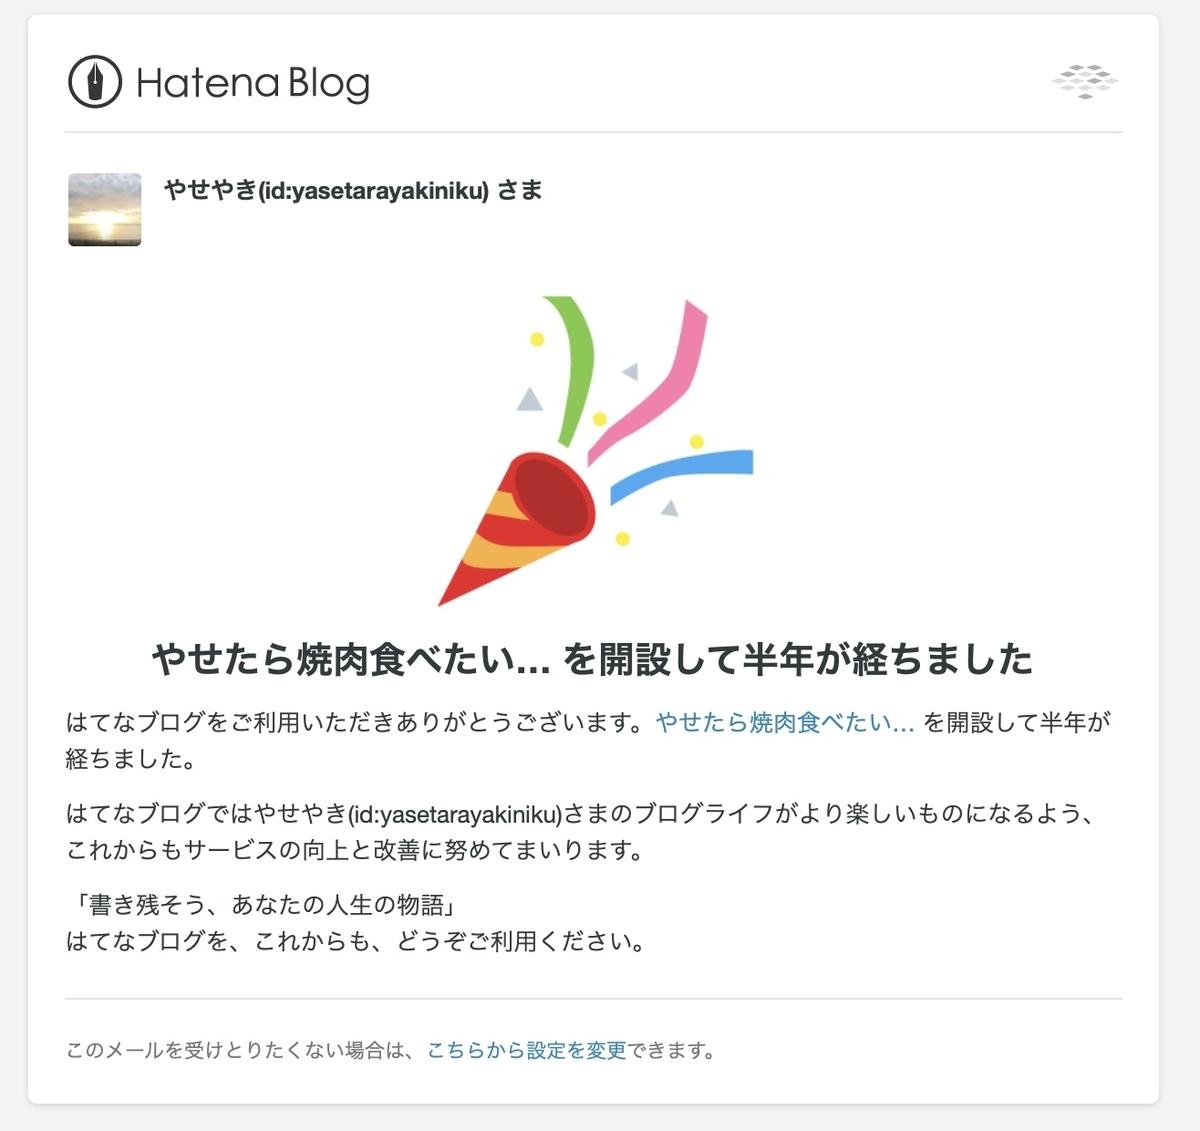 f:id:yasetarayakiniku:20190908072520j:plain